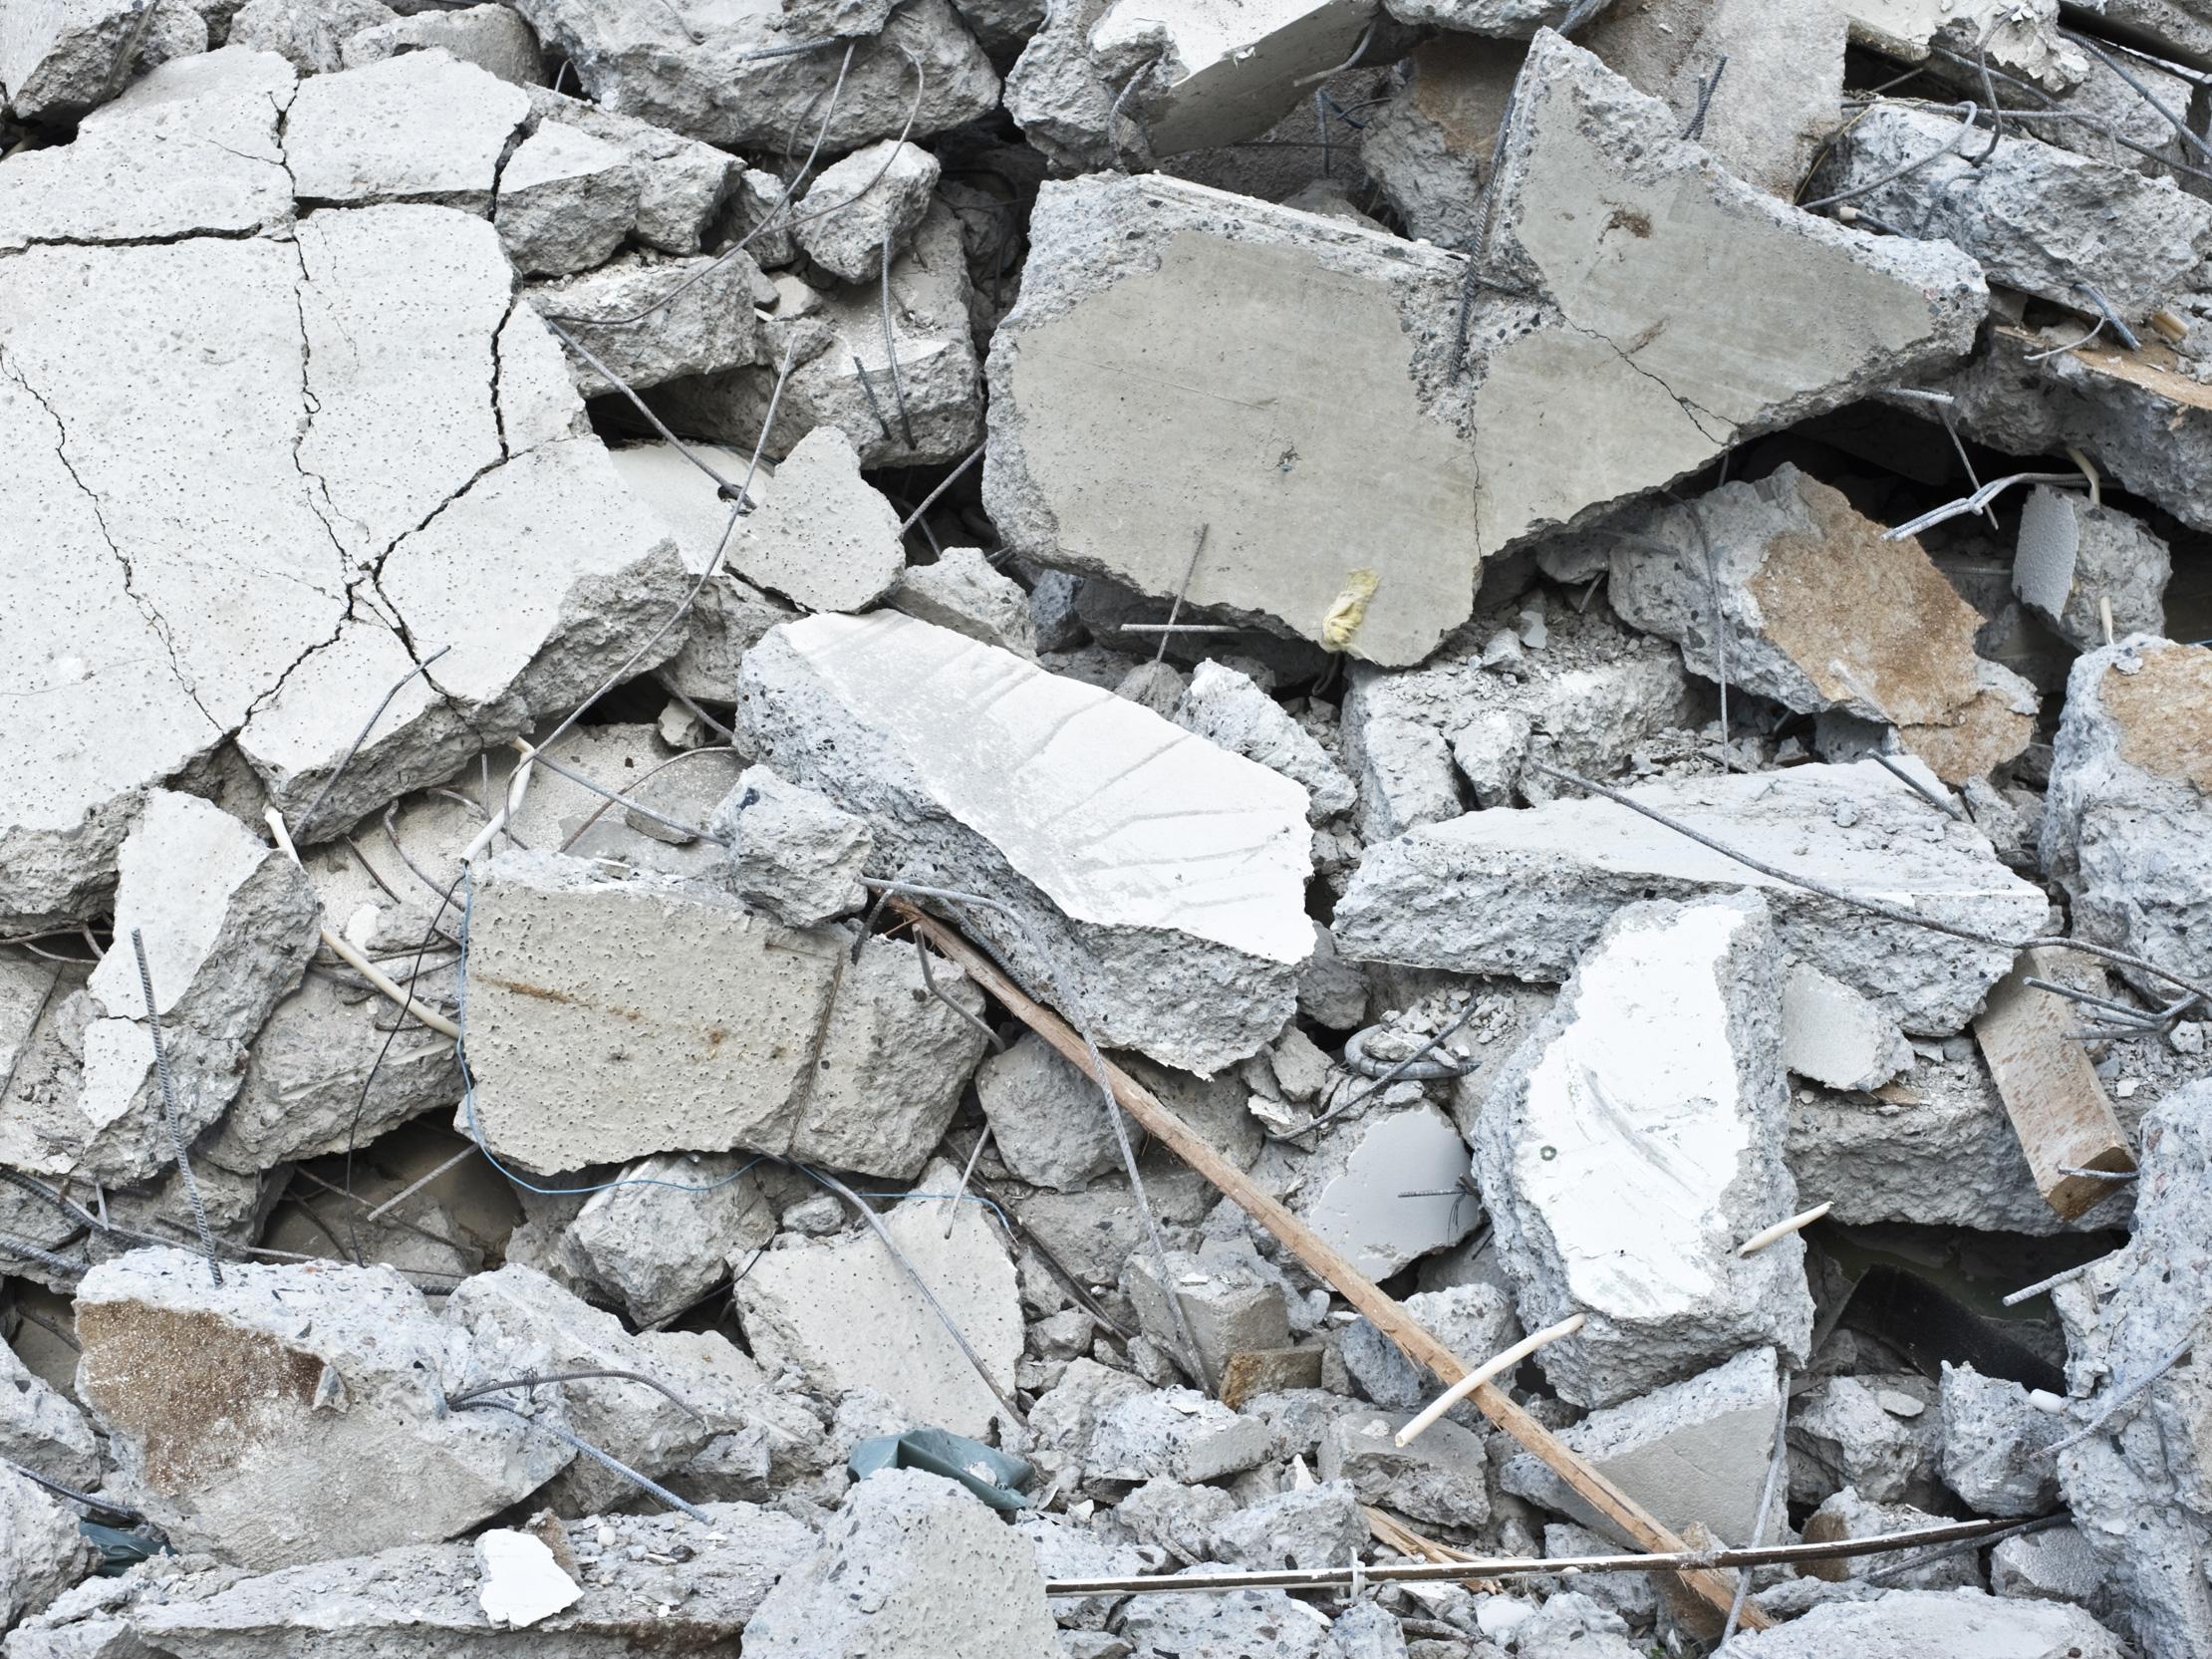 Beton vil rime på bæredygtighed